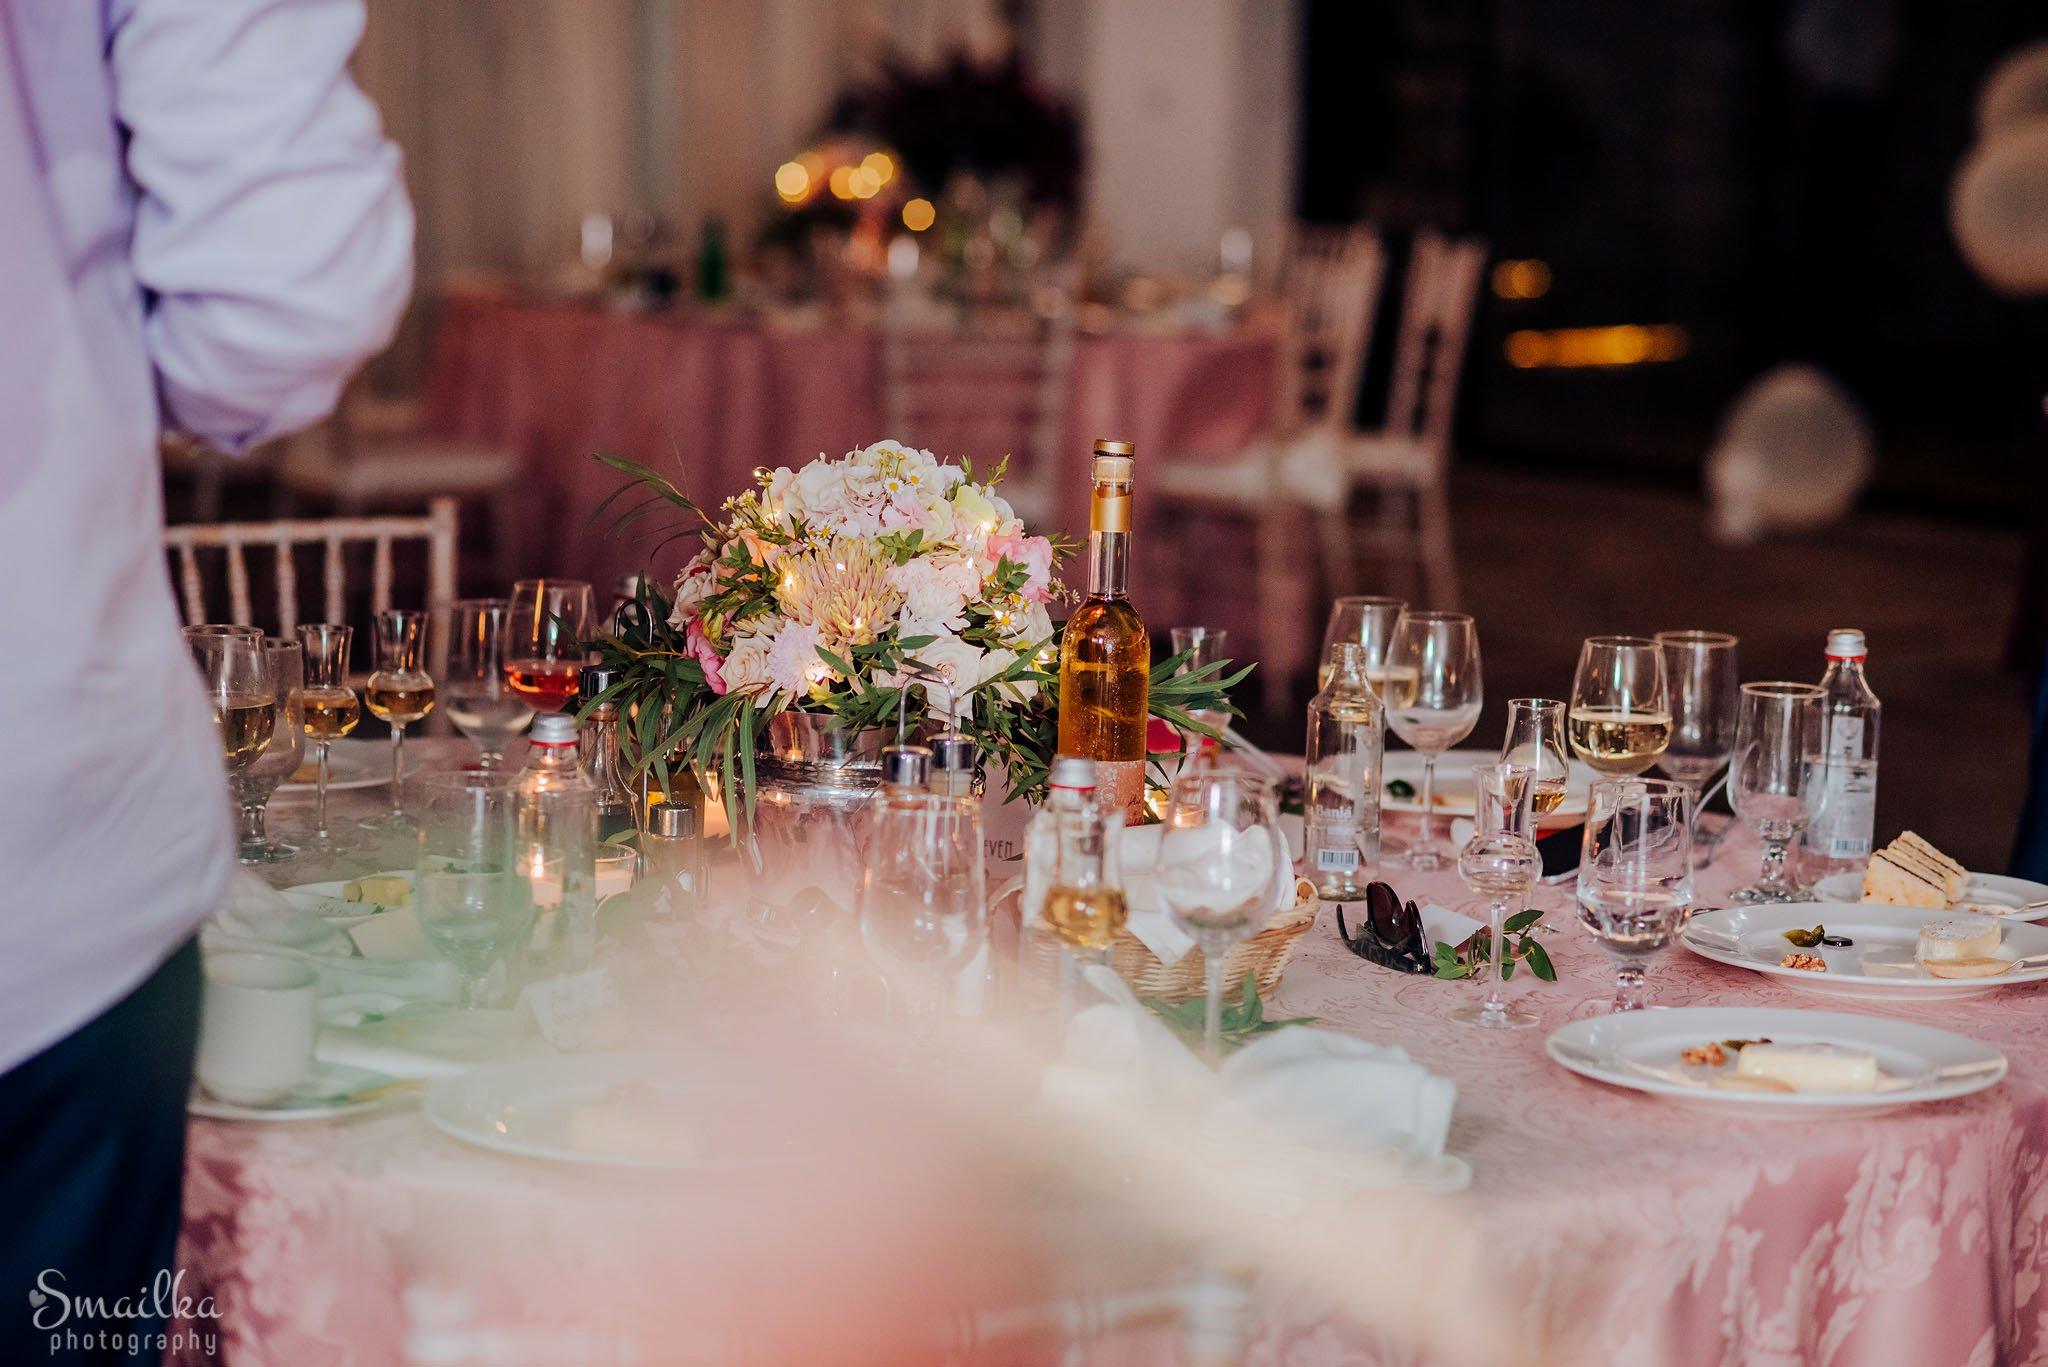 Wedding celebration food and drinks at Black Sea Rama